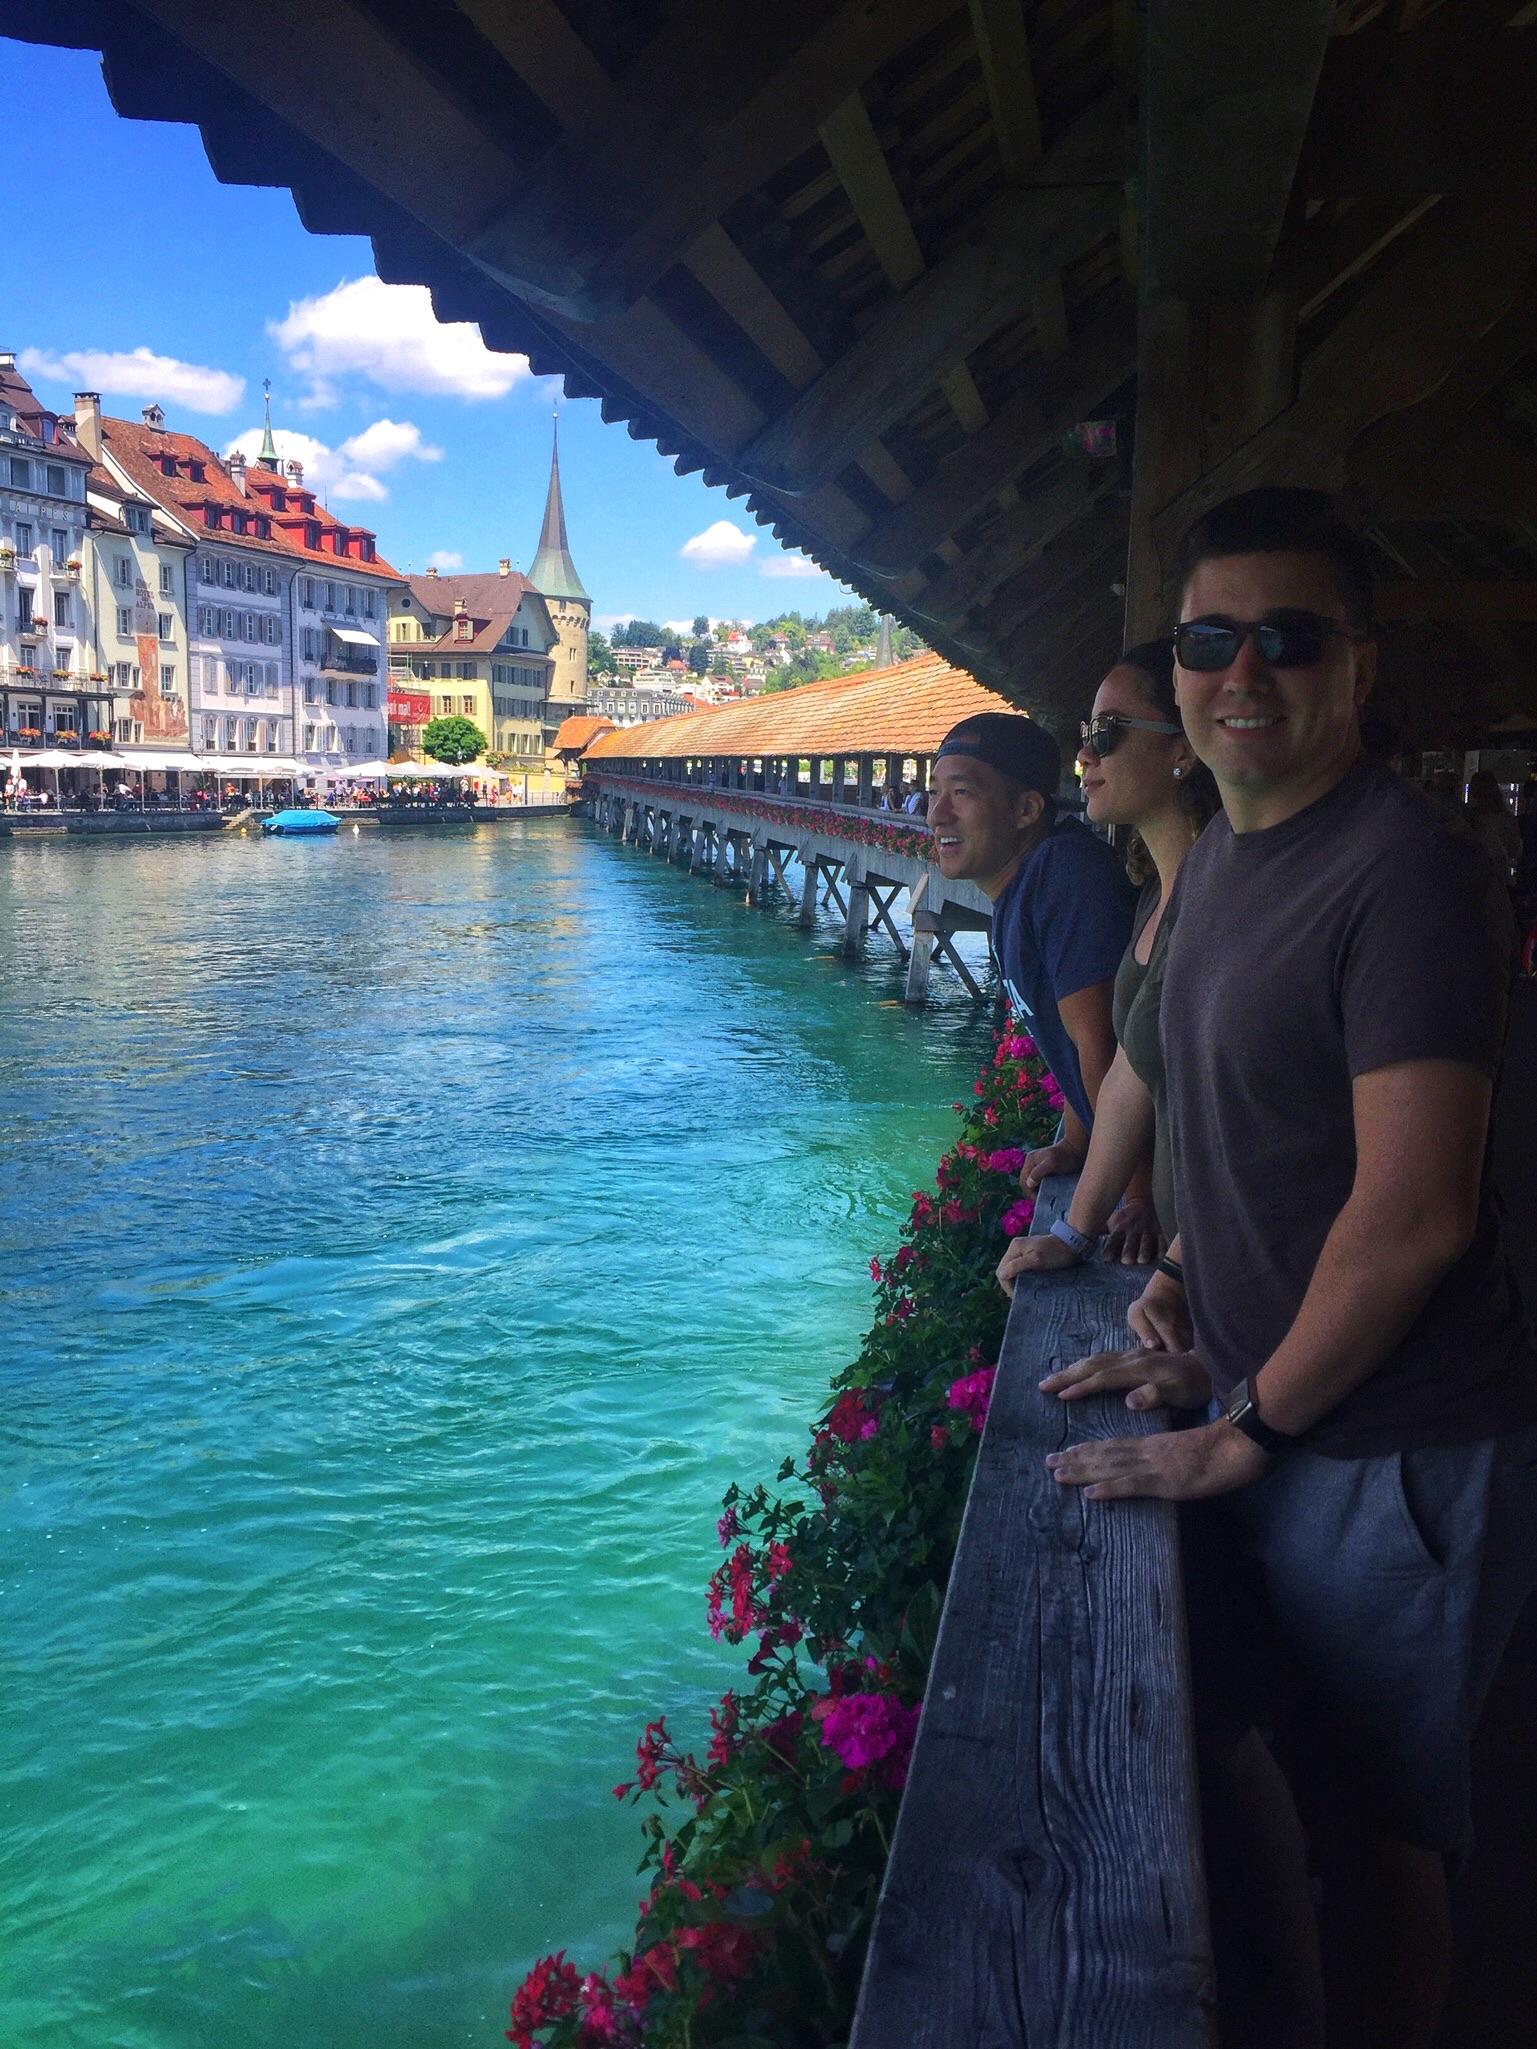 On a 15th century wooden bridge in Lucerne.